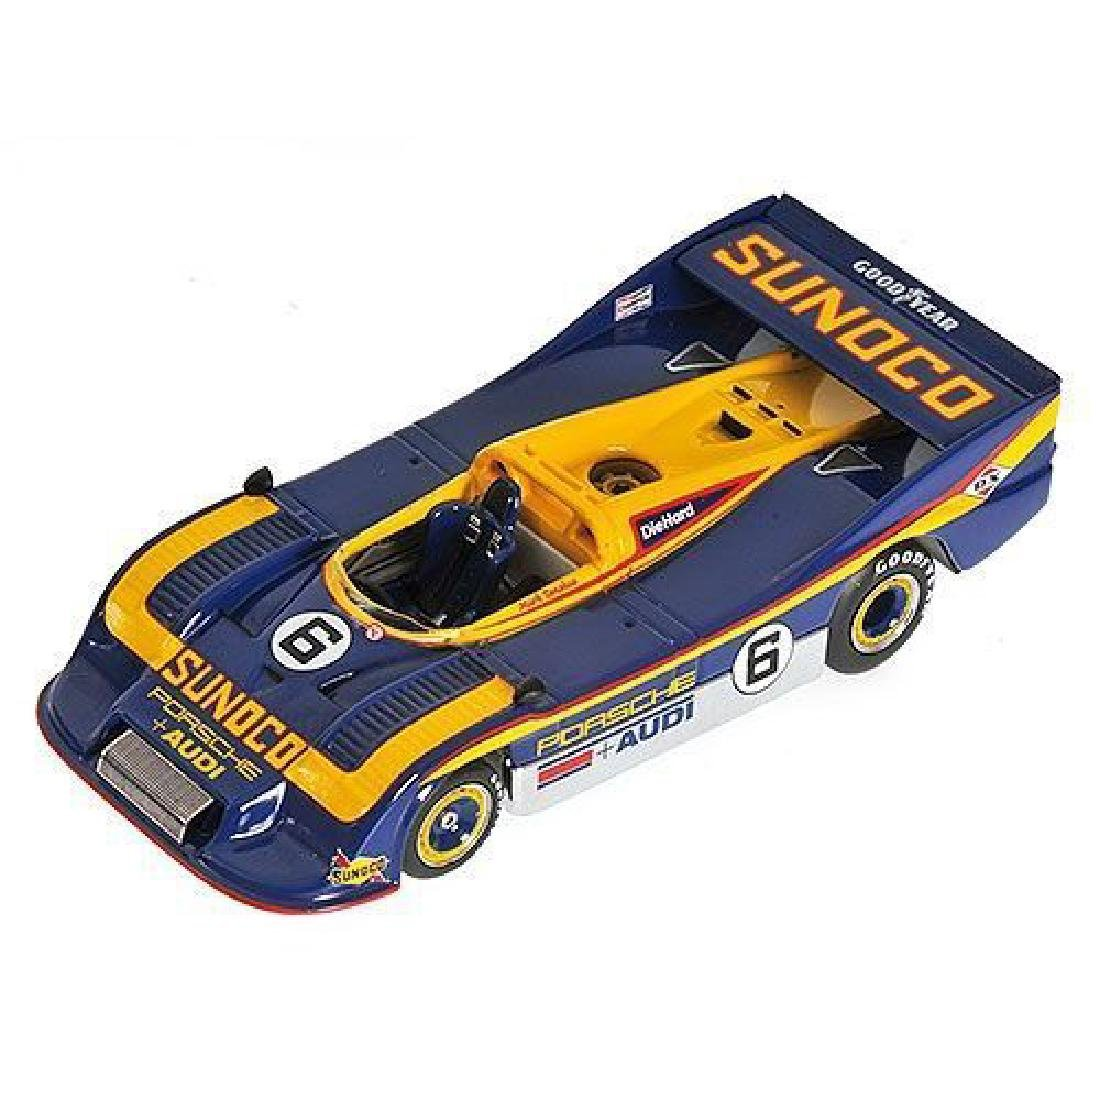 Minichamps Scale 1:43 Porsche 911 917 Mark Donohue 1973 - 7